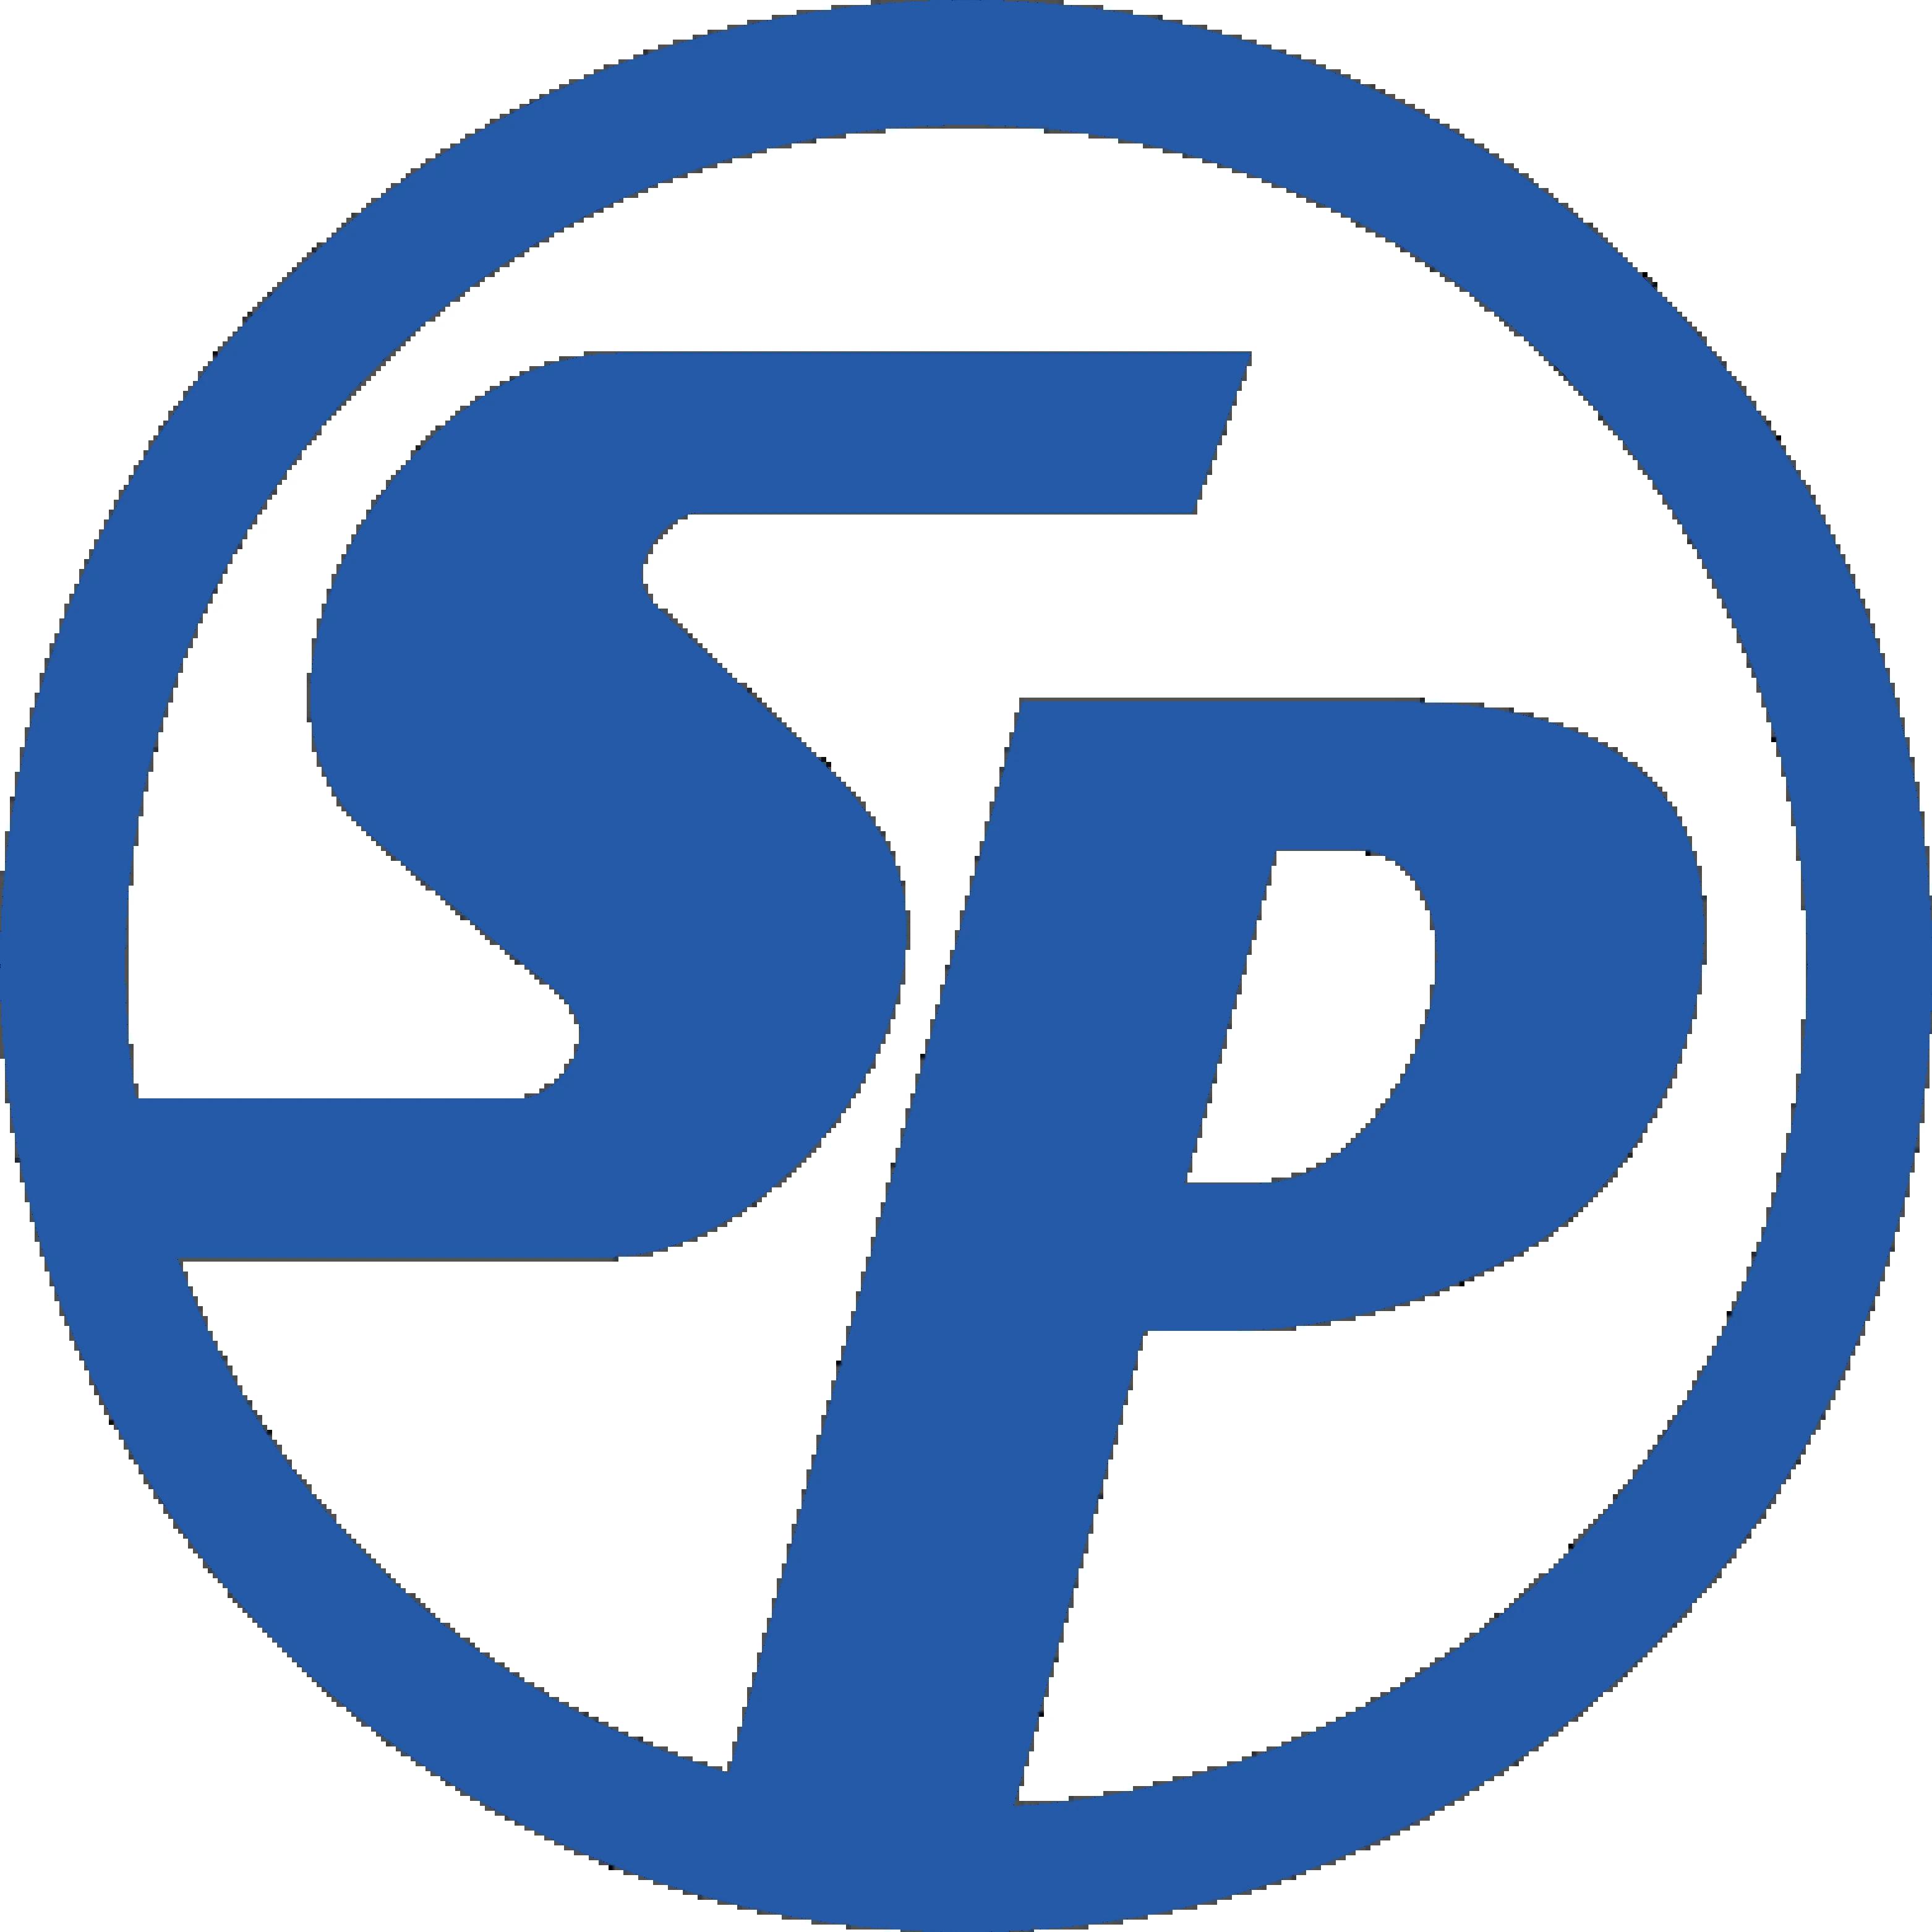 logo_SoloPublicid.jpg?v=1598903106